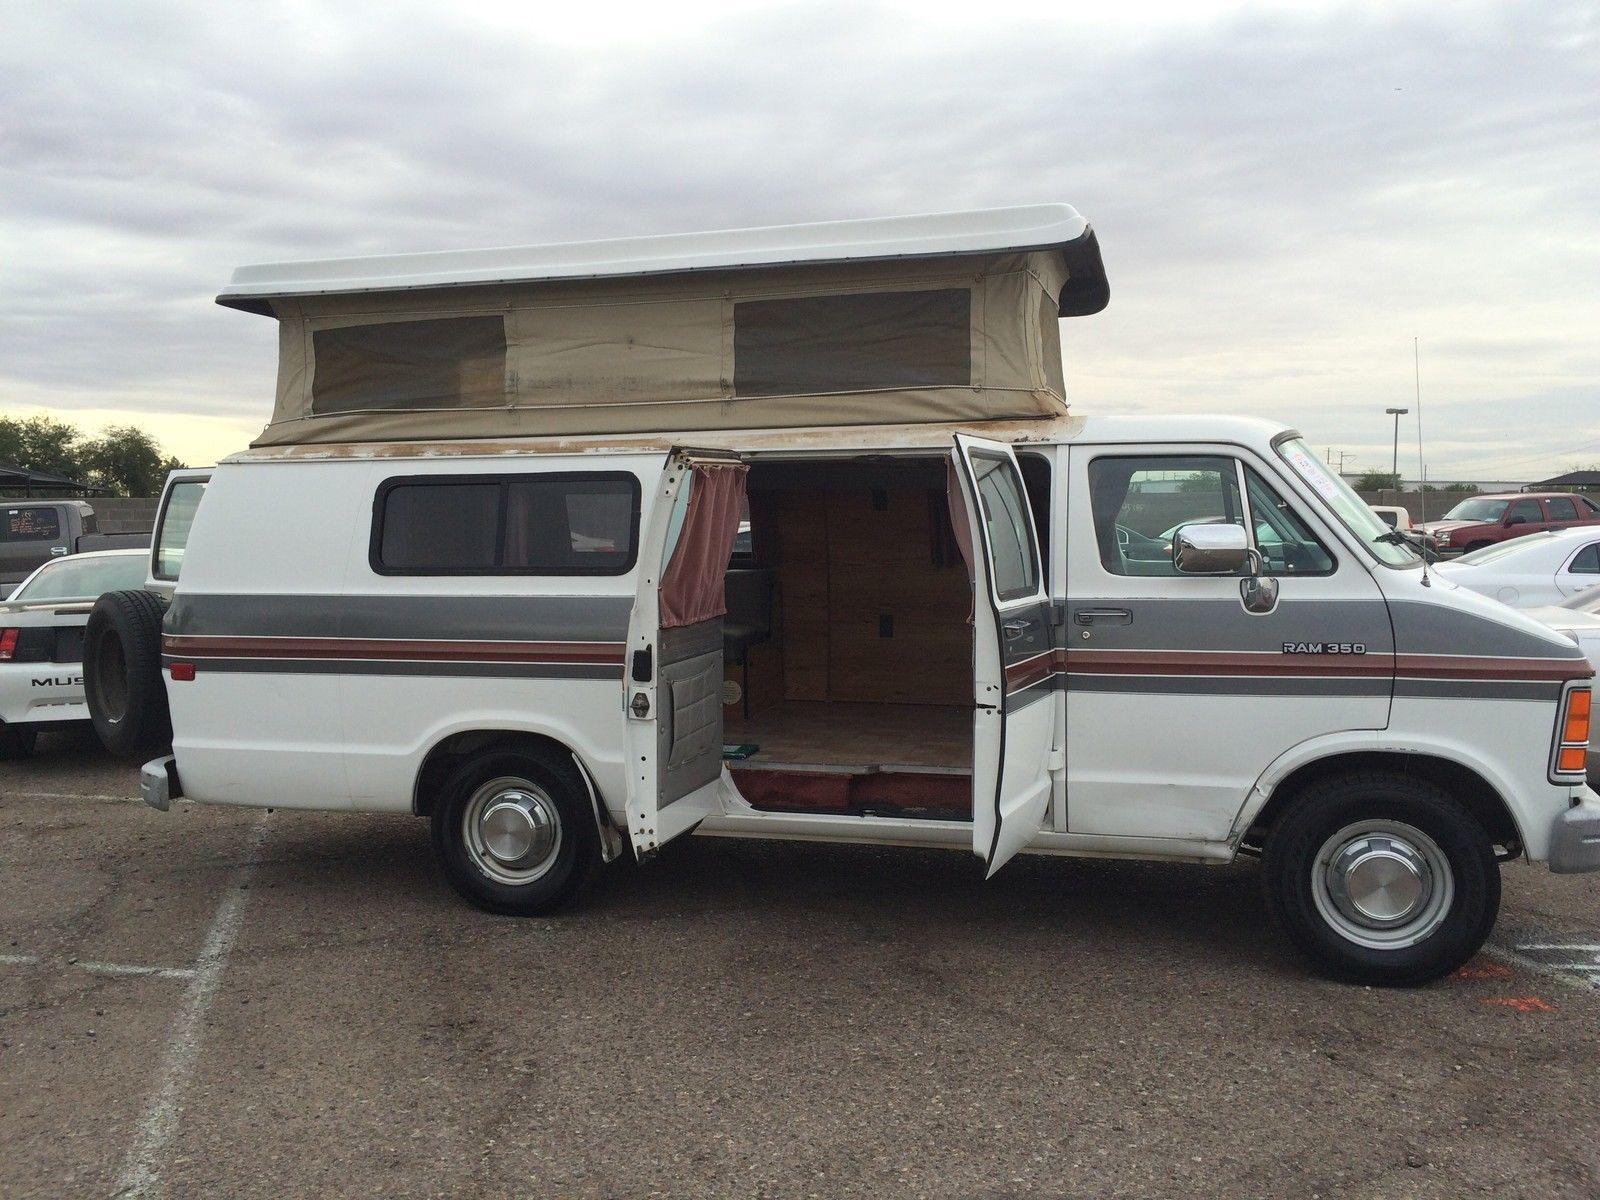 1991 Dodge B3500 Camper Custom cars for sale, Dodge